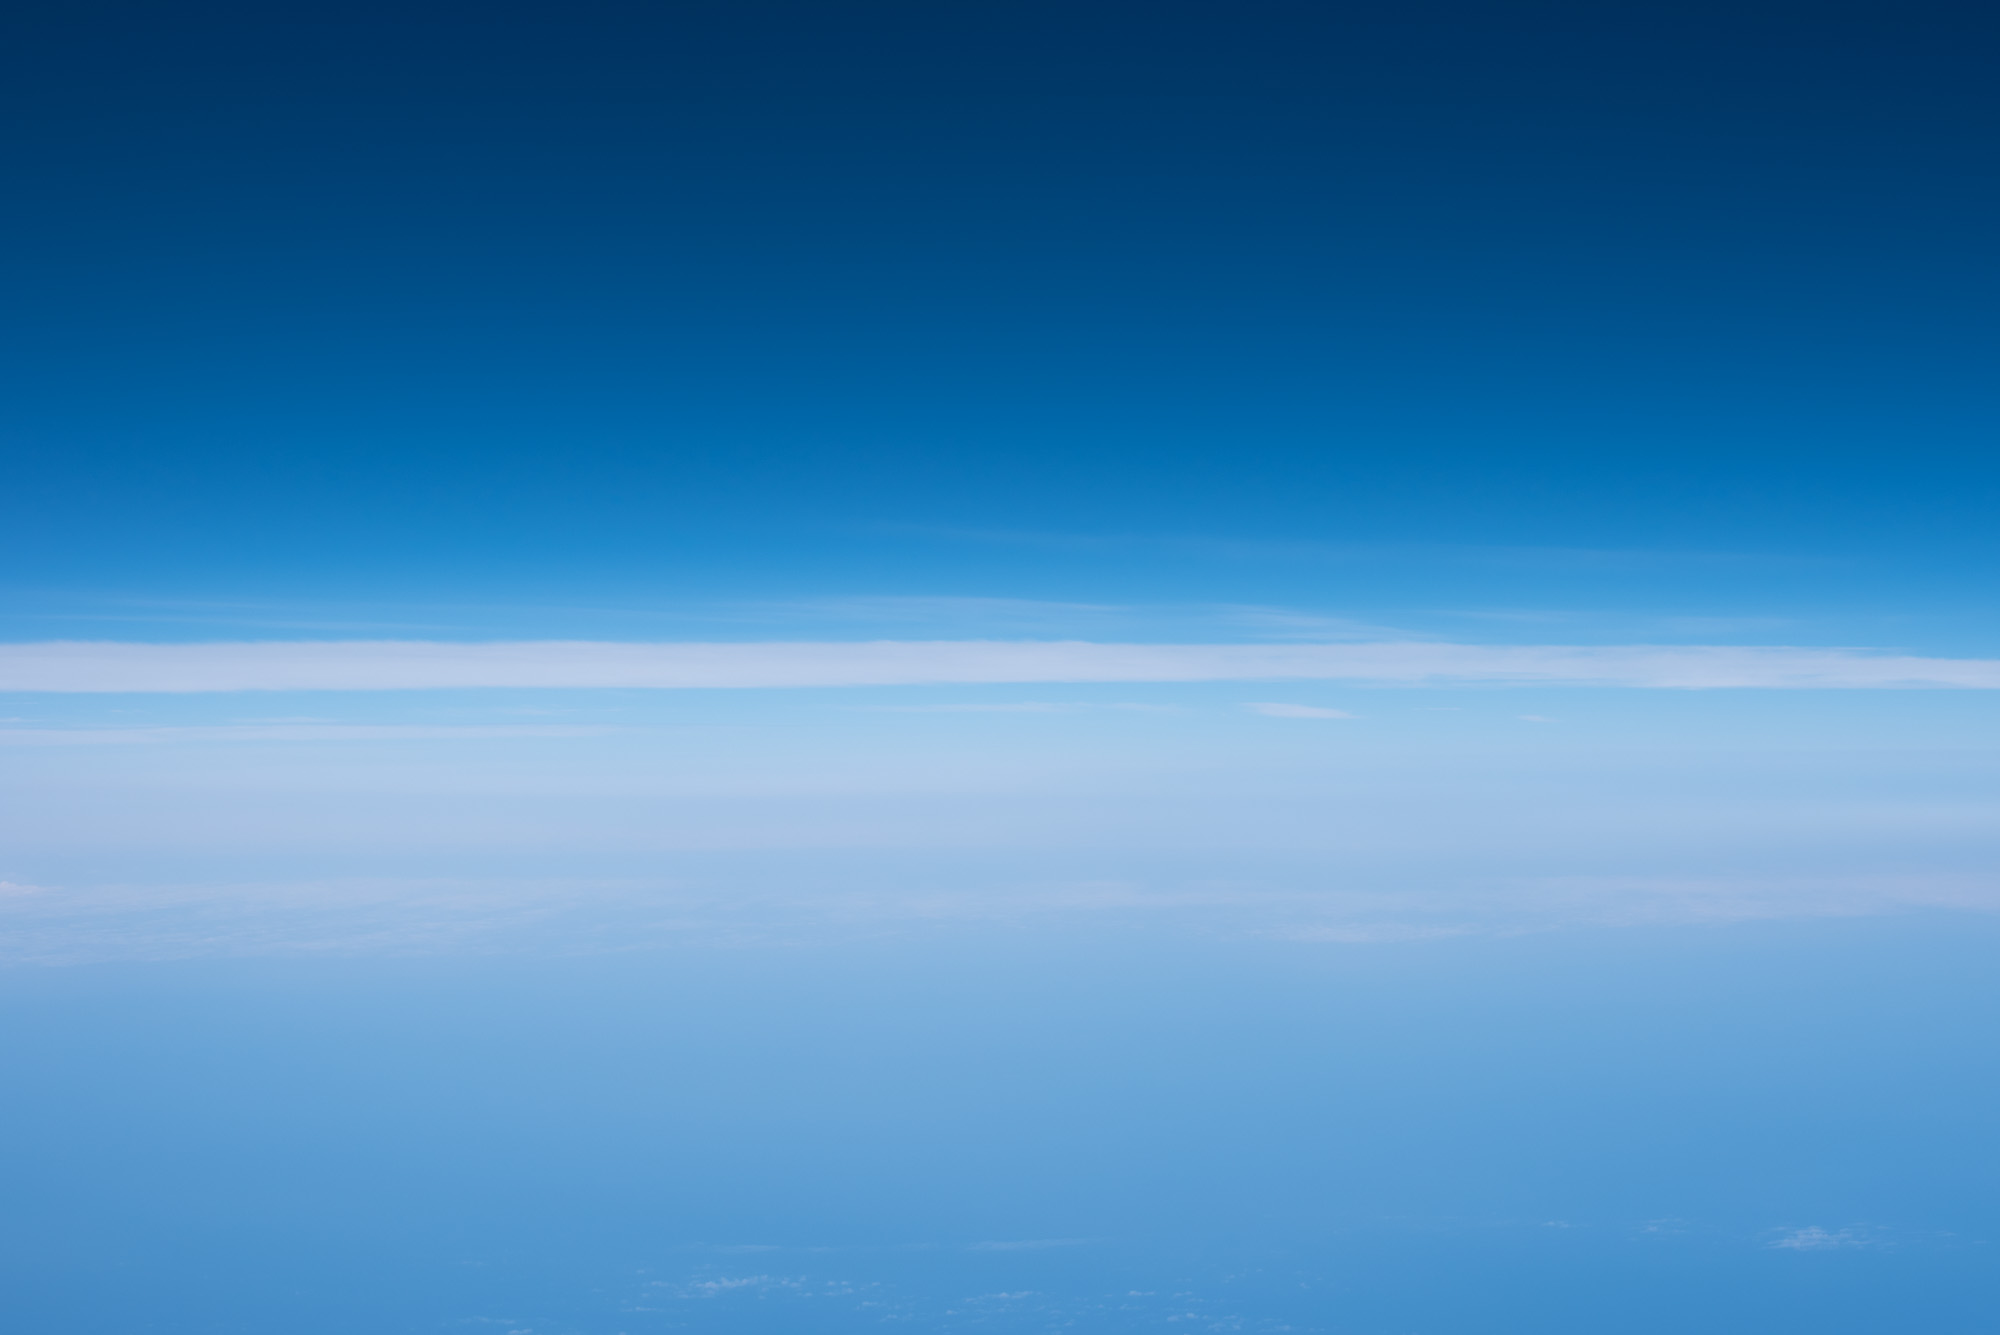 costa rica flights southwest